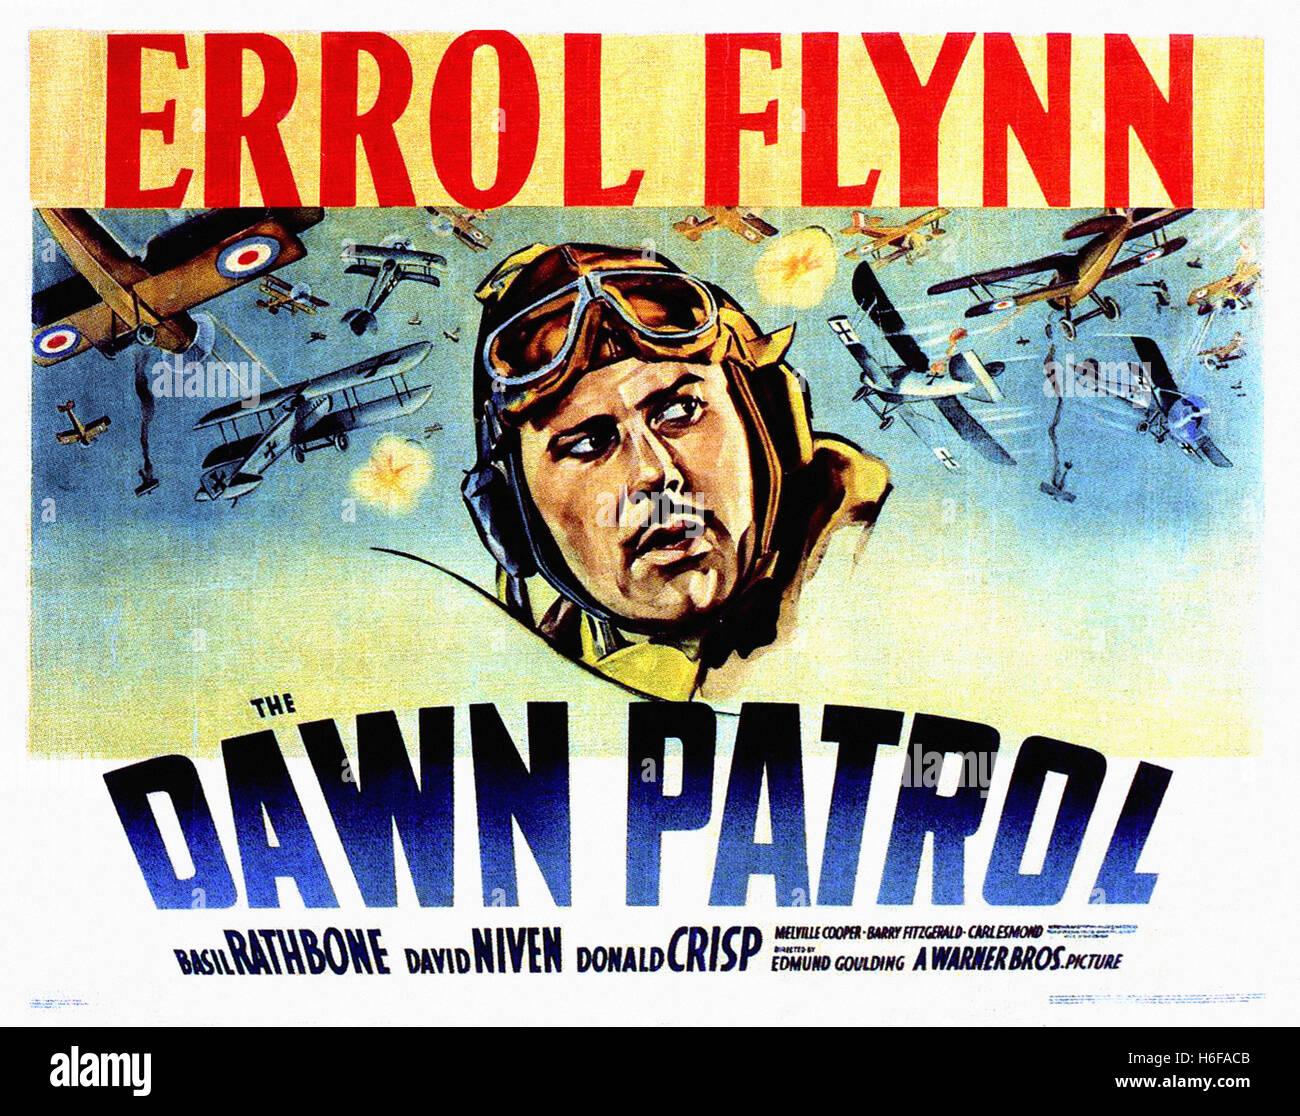 Dawn Patrol,The (1938) - Movie Poster - - Stock Image